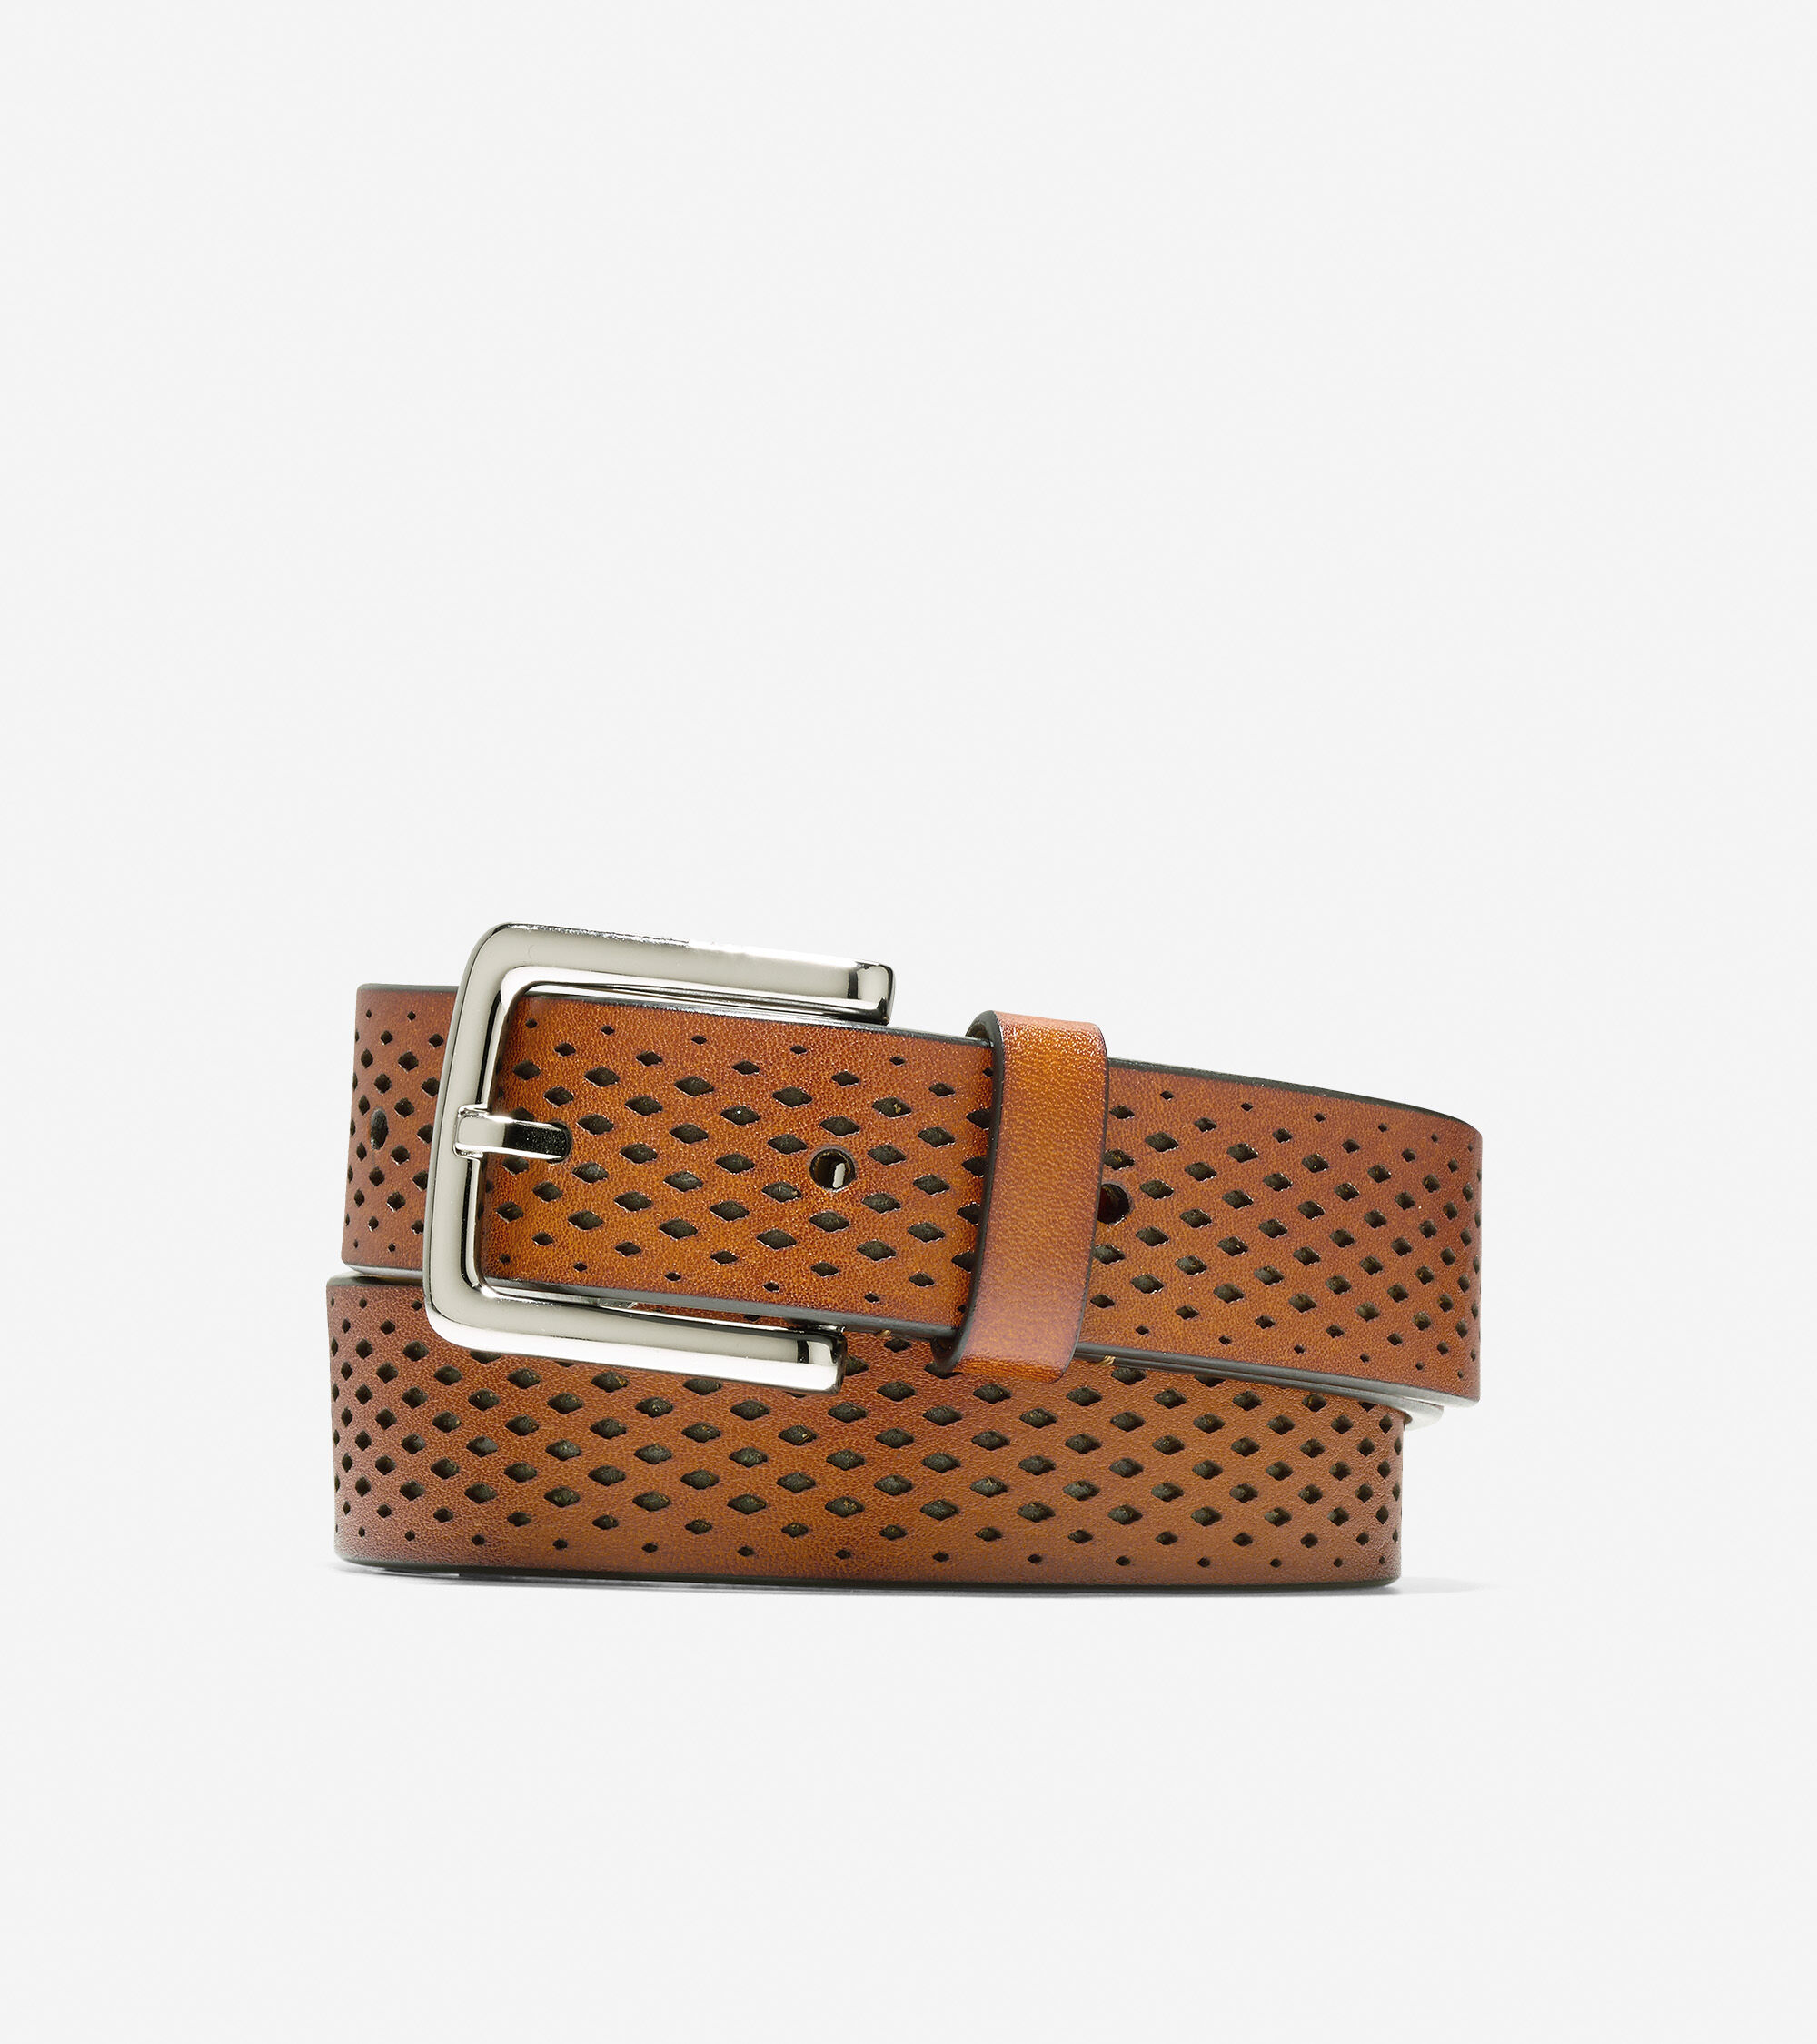 Men\'s Bags & Accessories : Wallets, Belts & More | Cole Haan